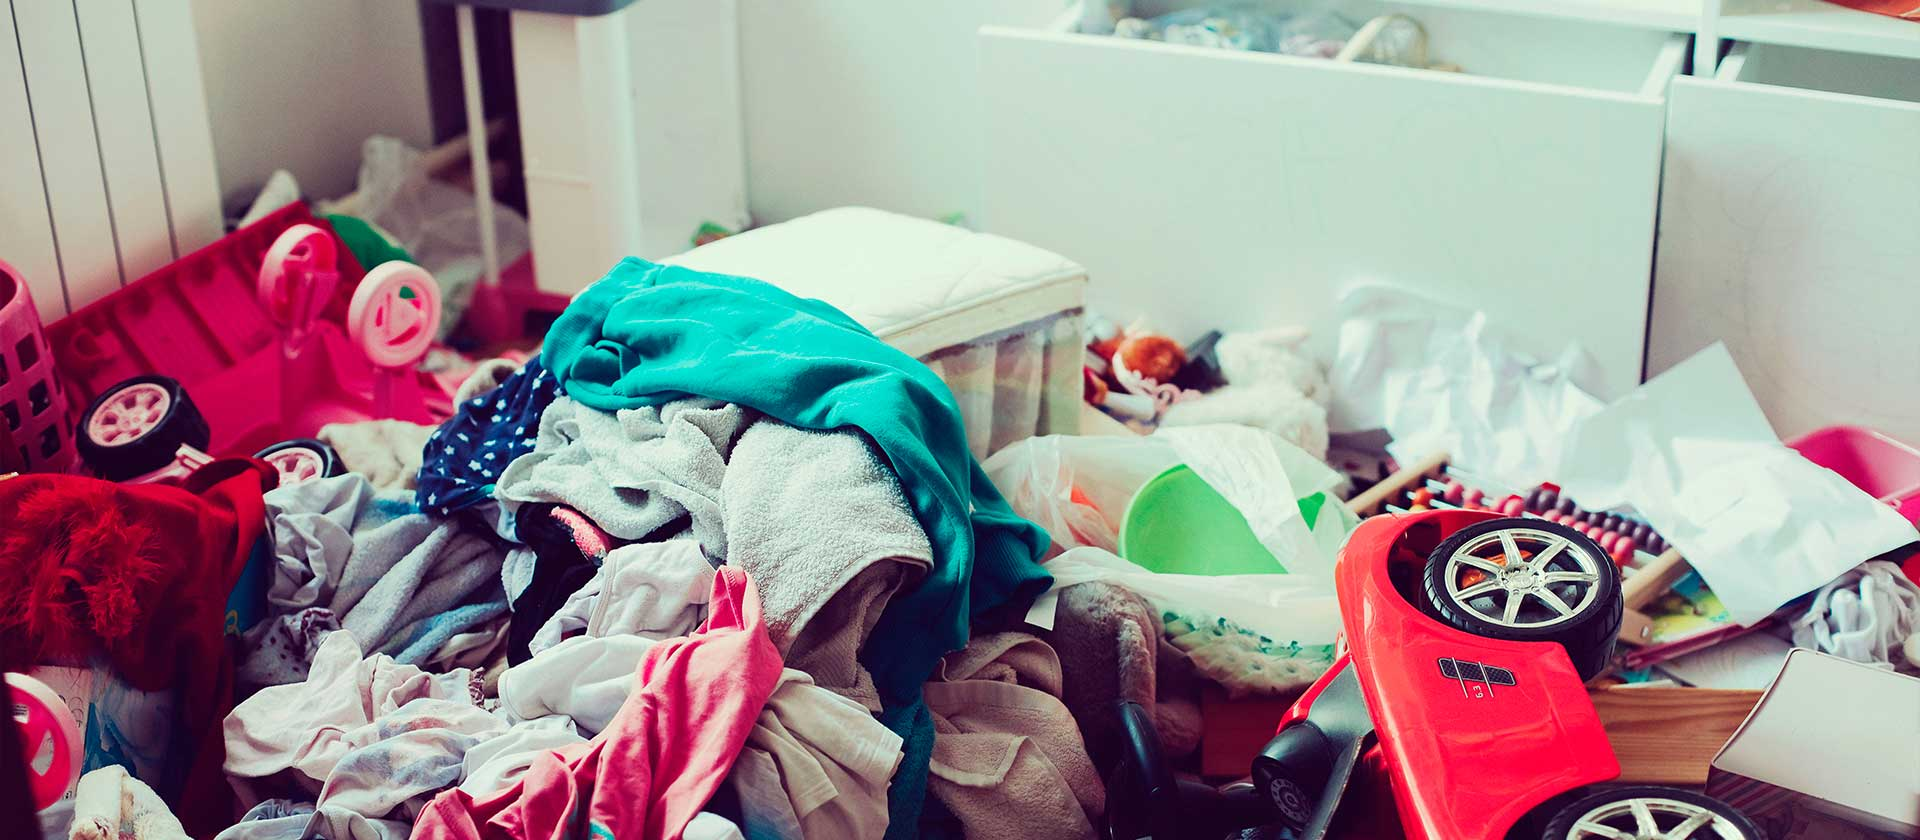 limpiar casa, limpieza hogar